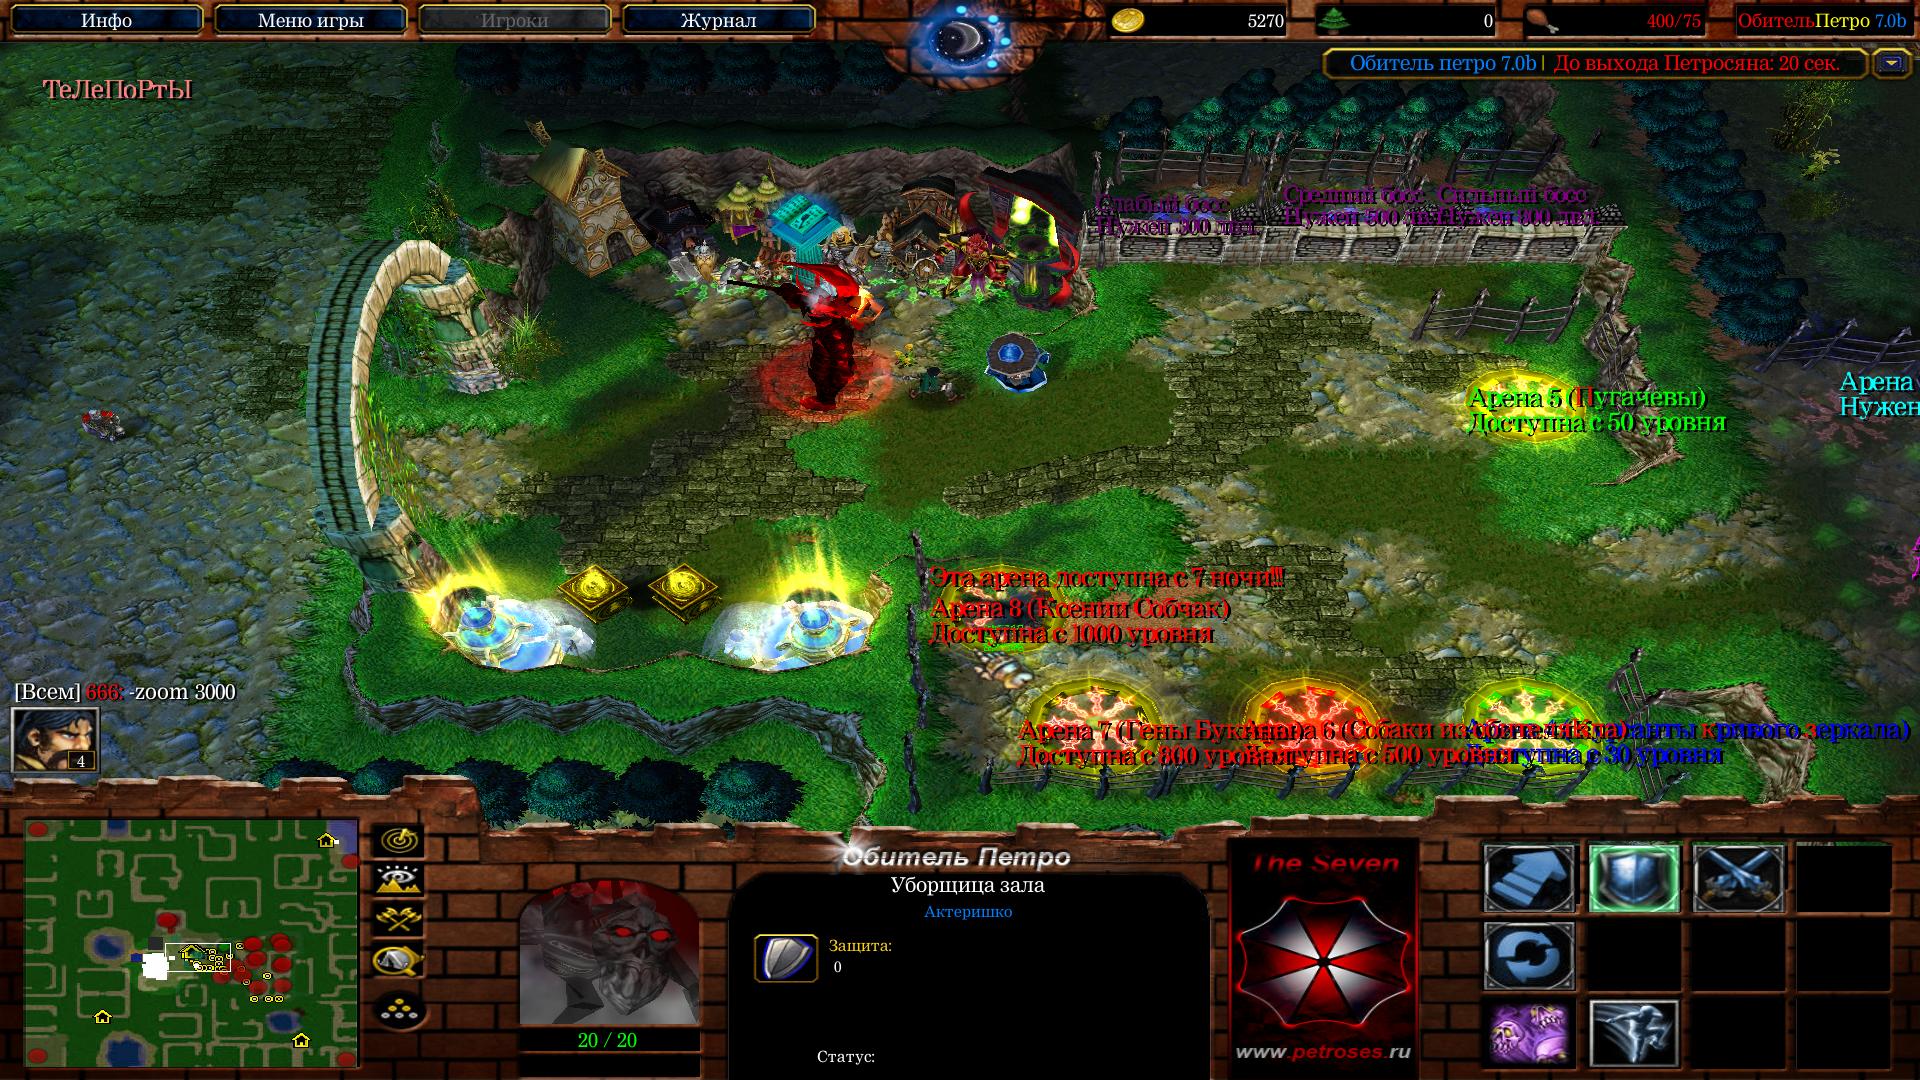 Warcraft 3 frozen throne 126a batlnet 2011 pc - увидь первым на newvmesteru